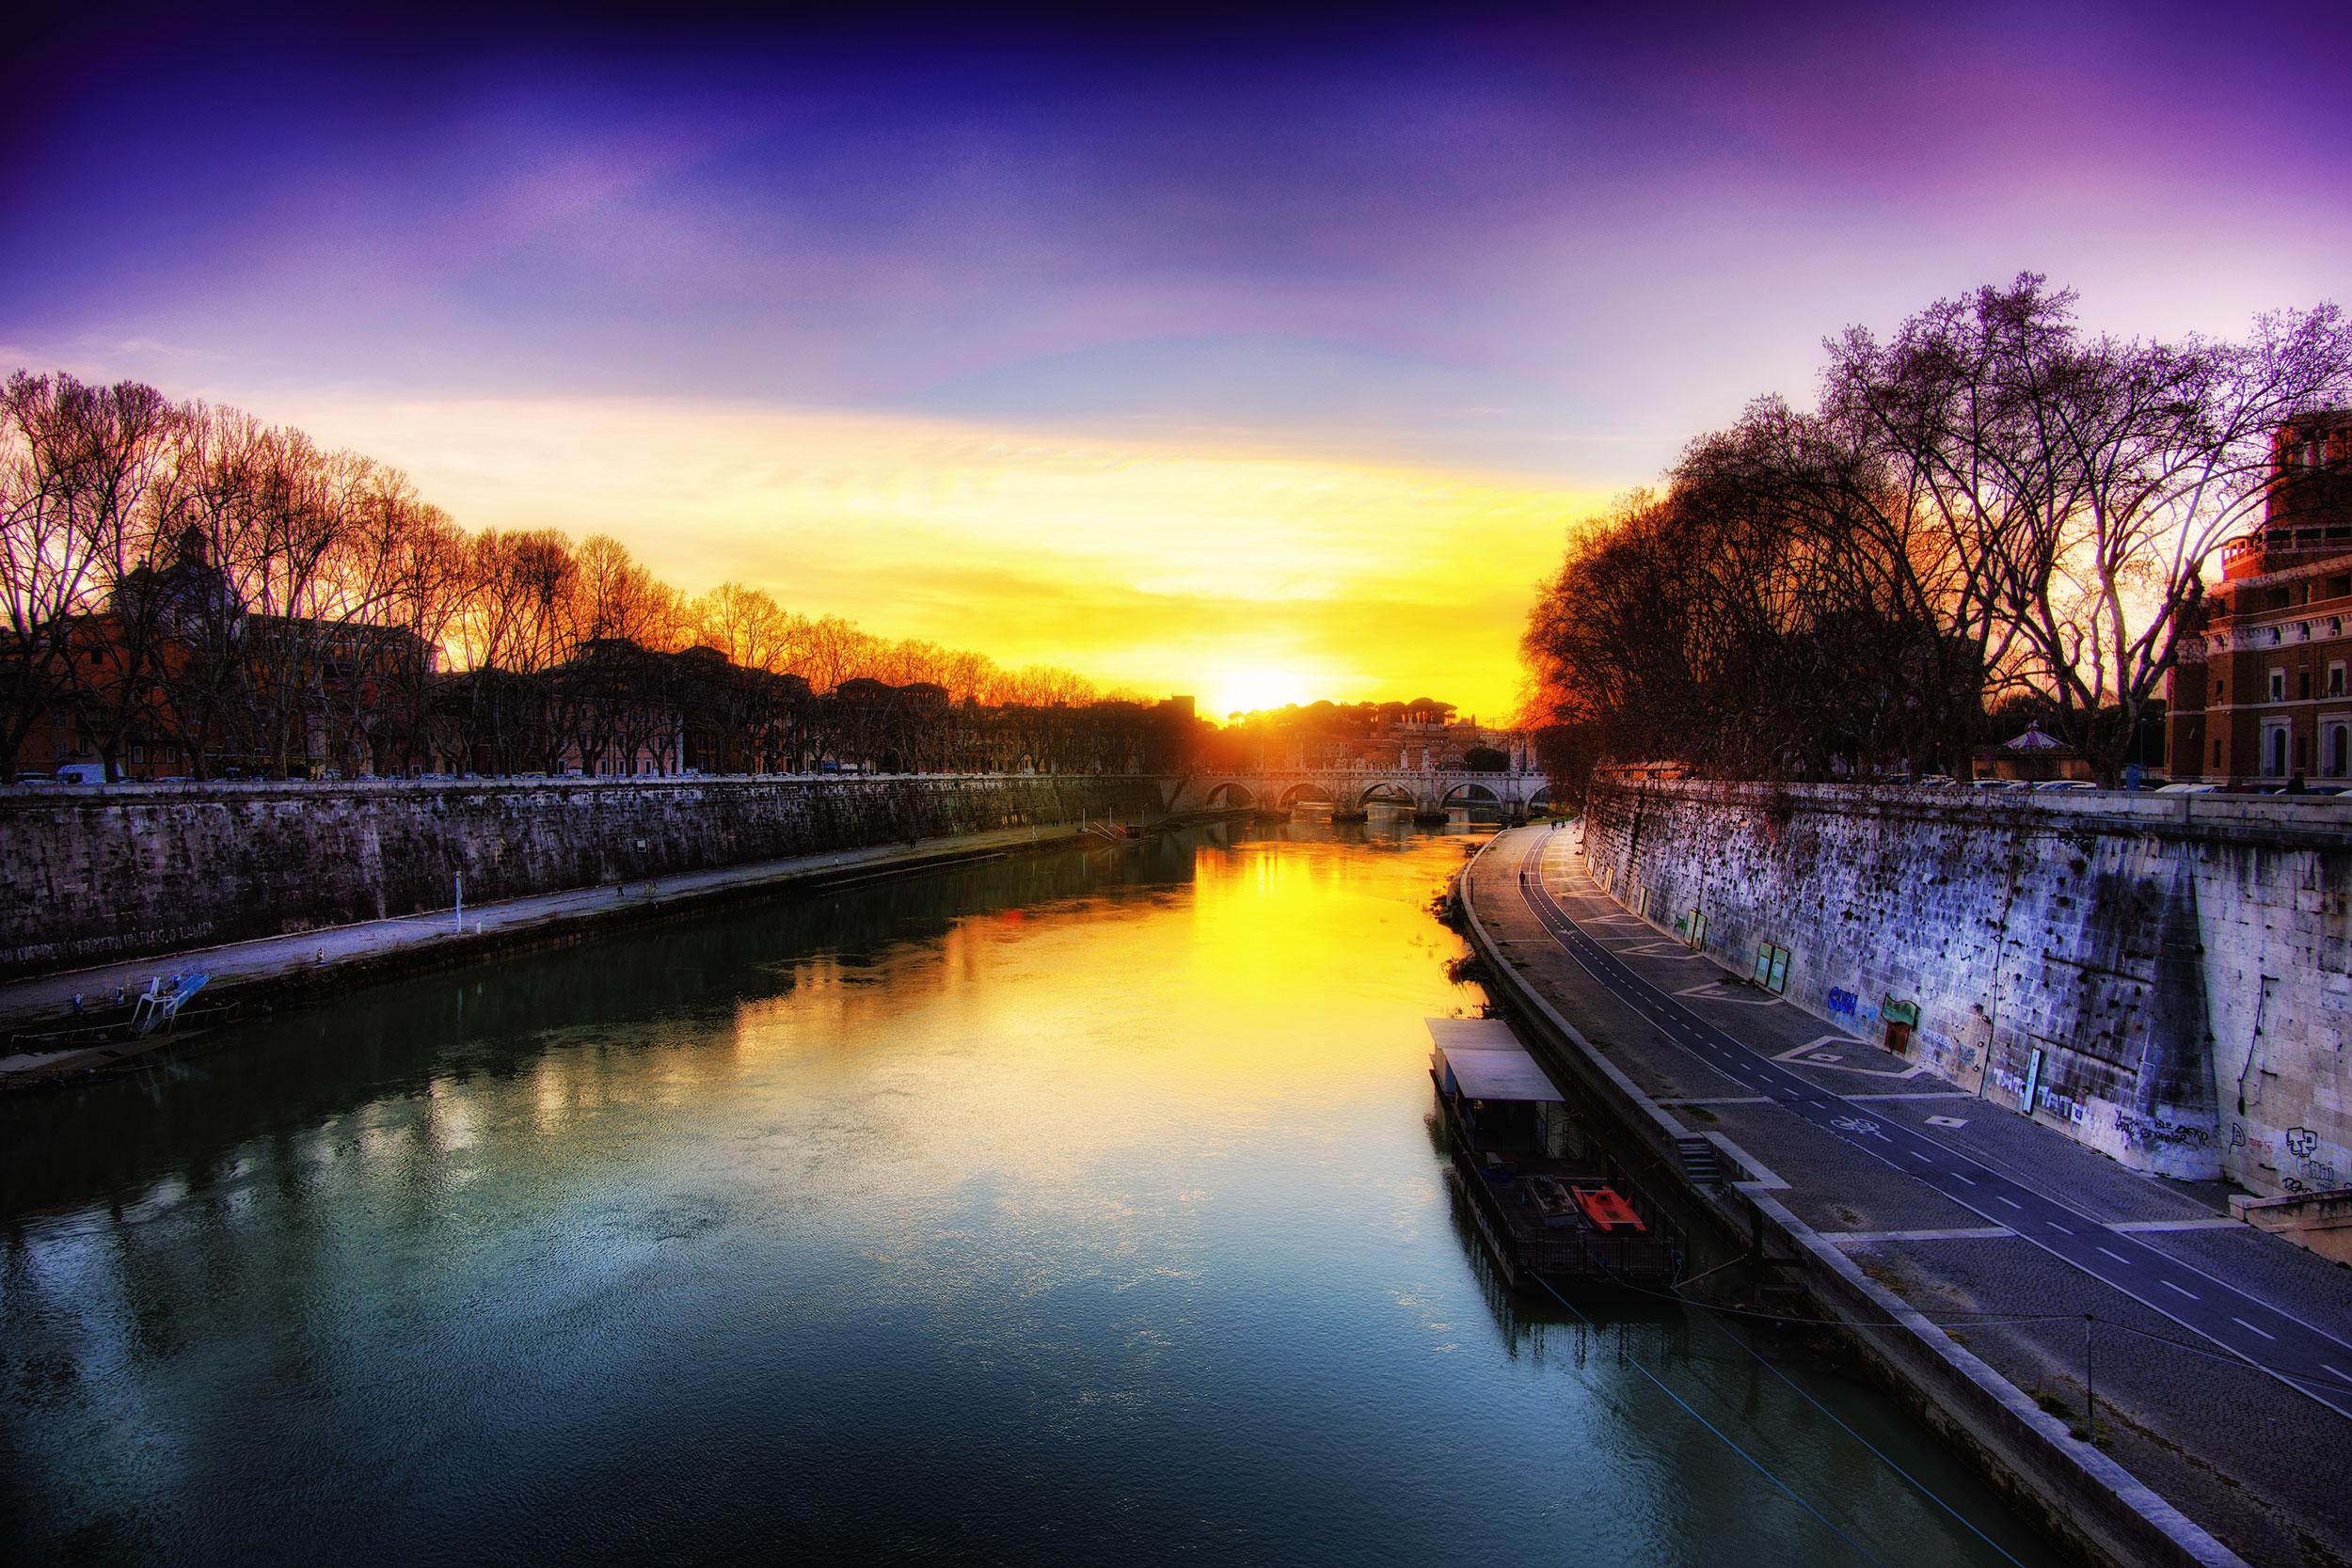 riverHDR4web22.jpg